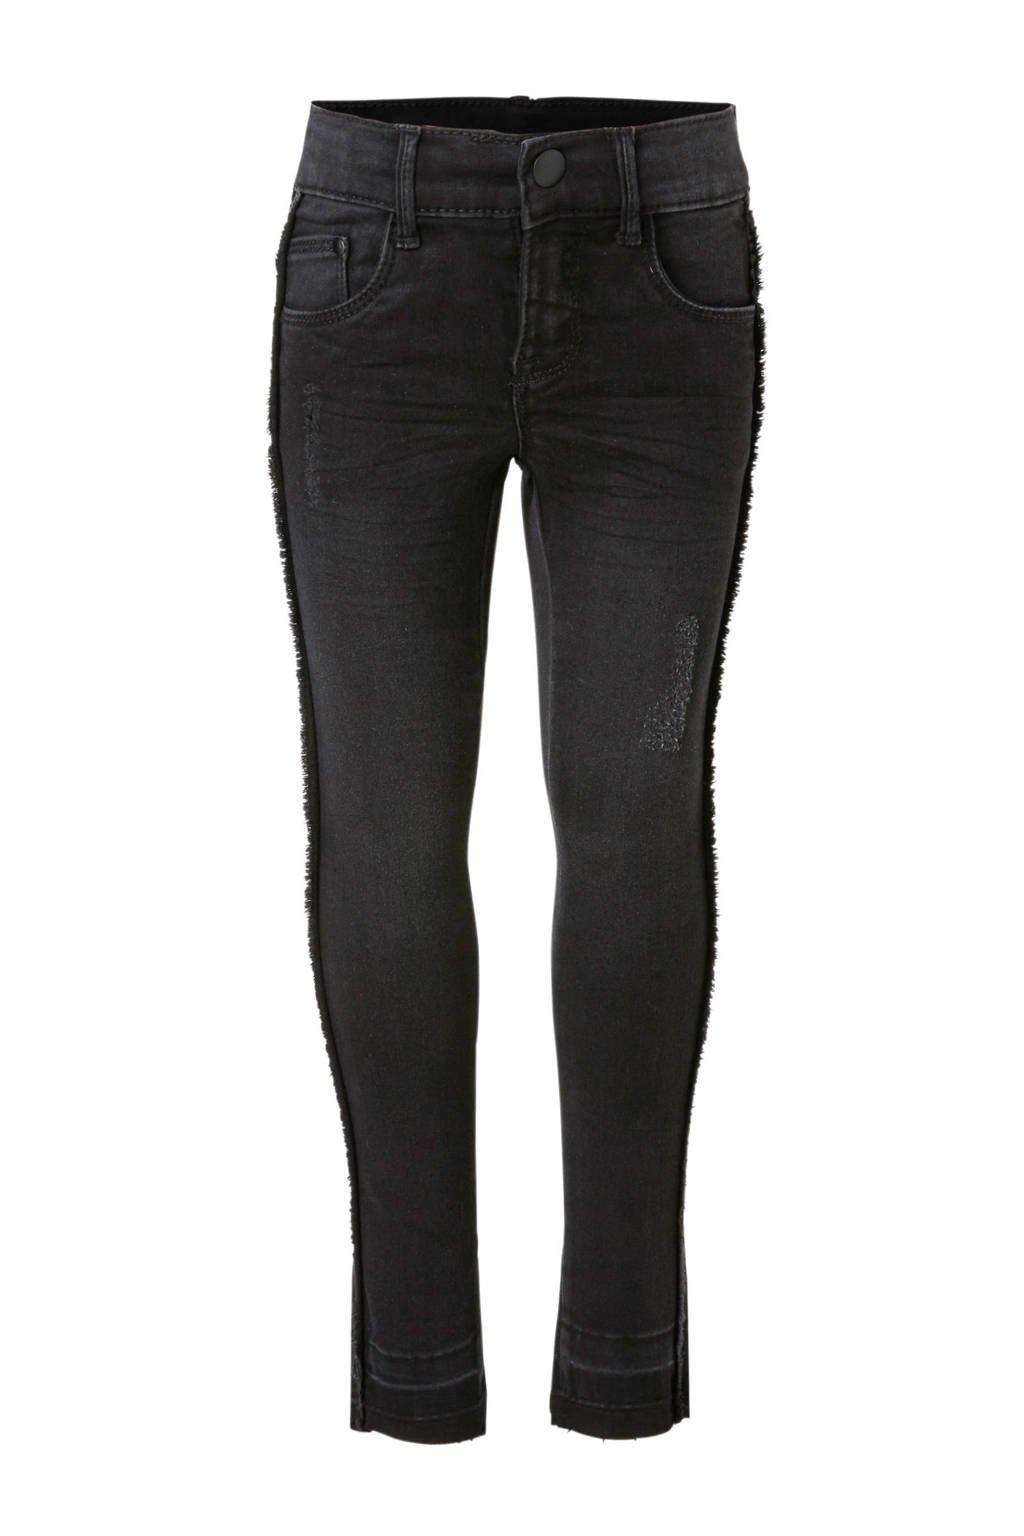 NAME IT KIDS skinny jeans Polly Taffy zwart, Zwart